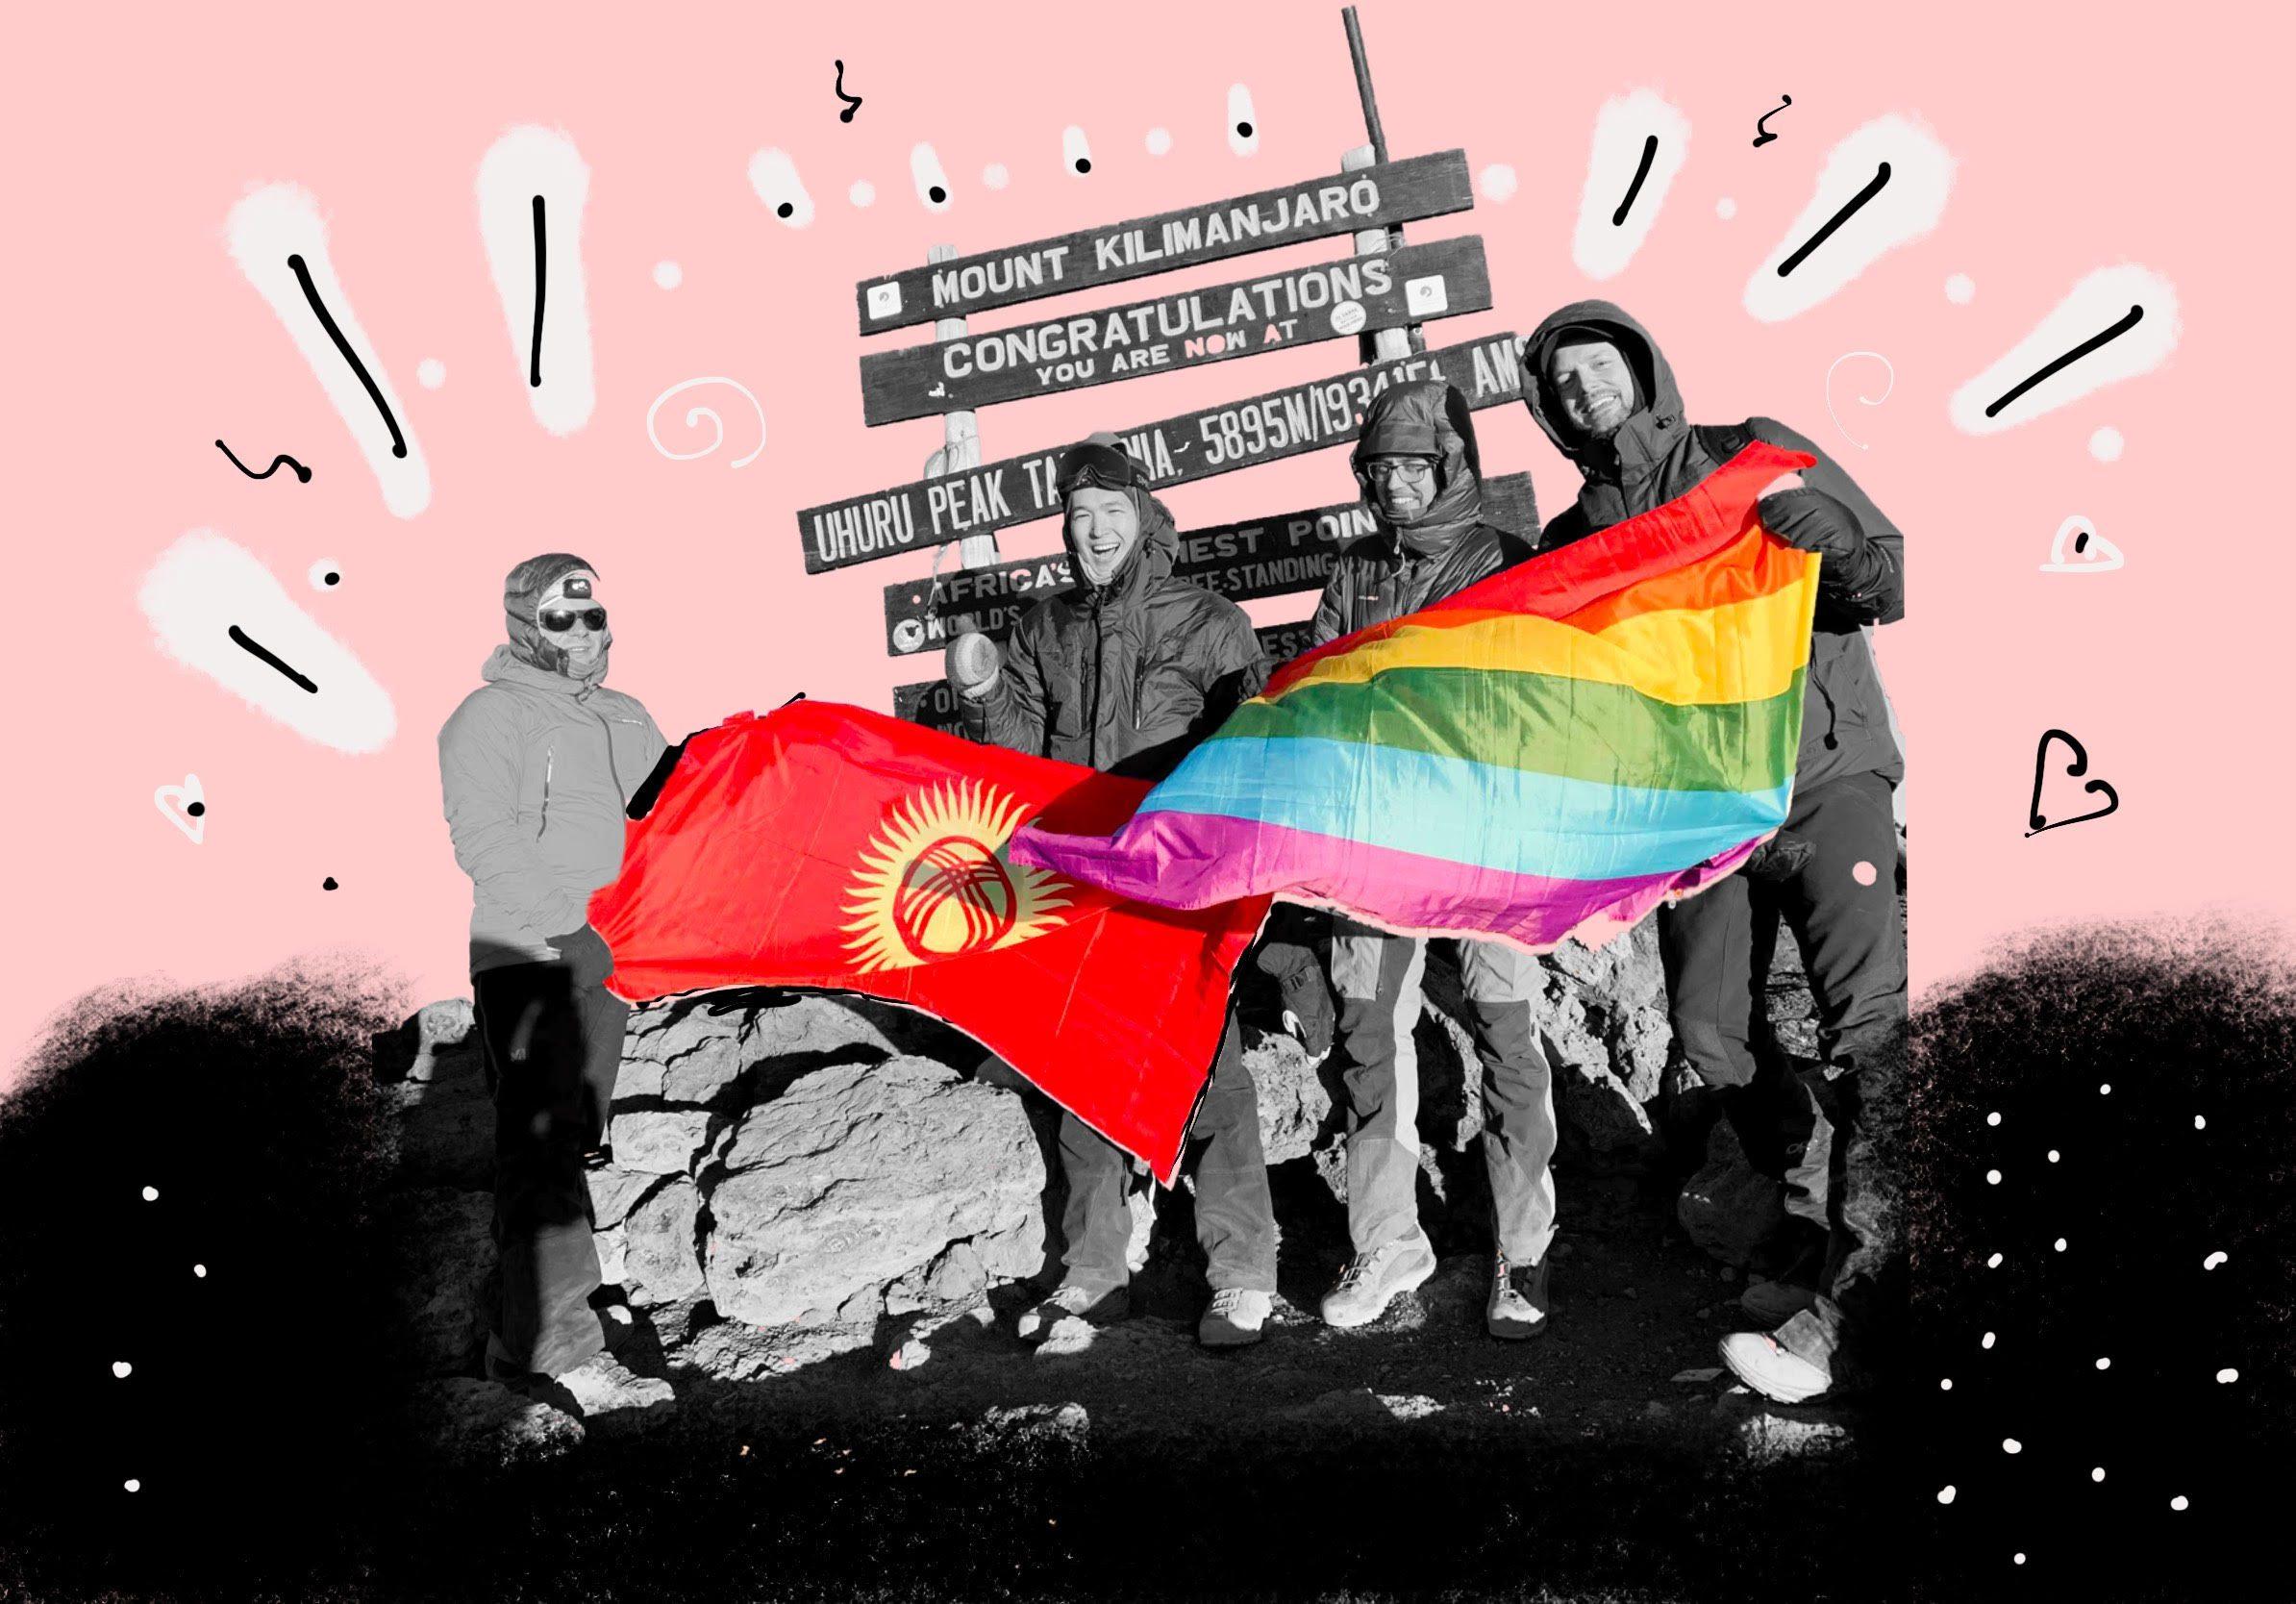 DADDY MAGAZINE SCALING AGAINST HOMOPHOBIA header